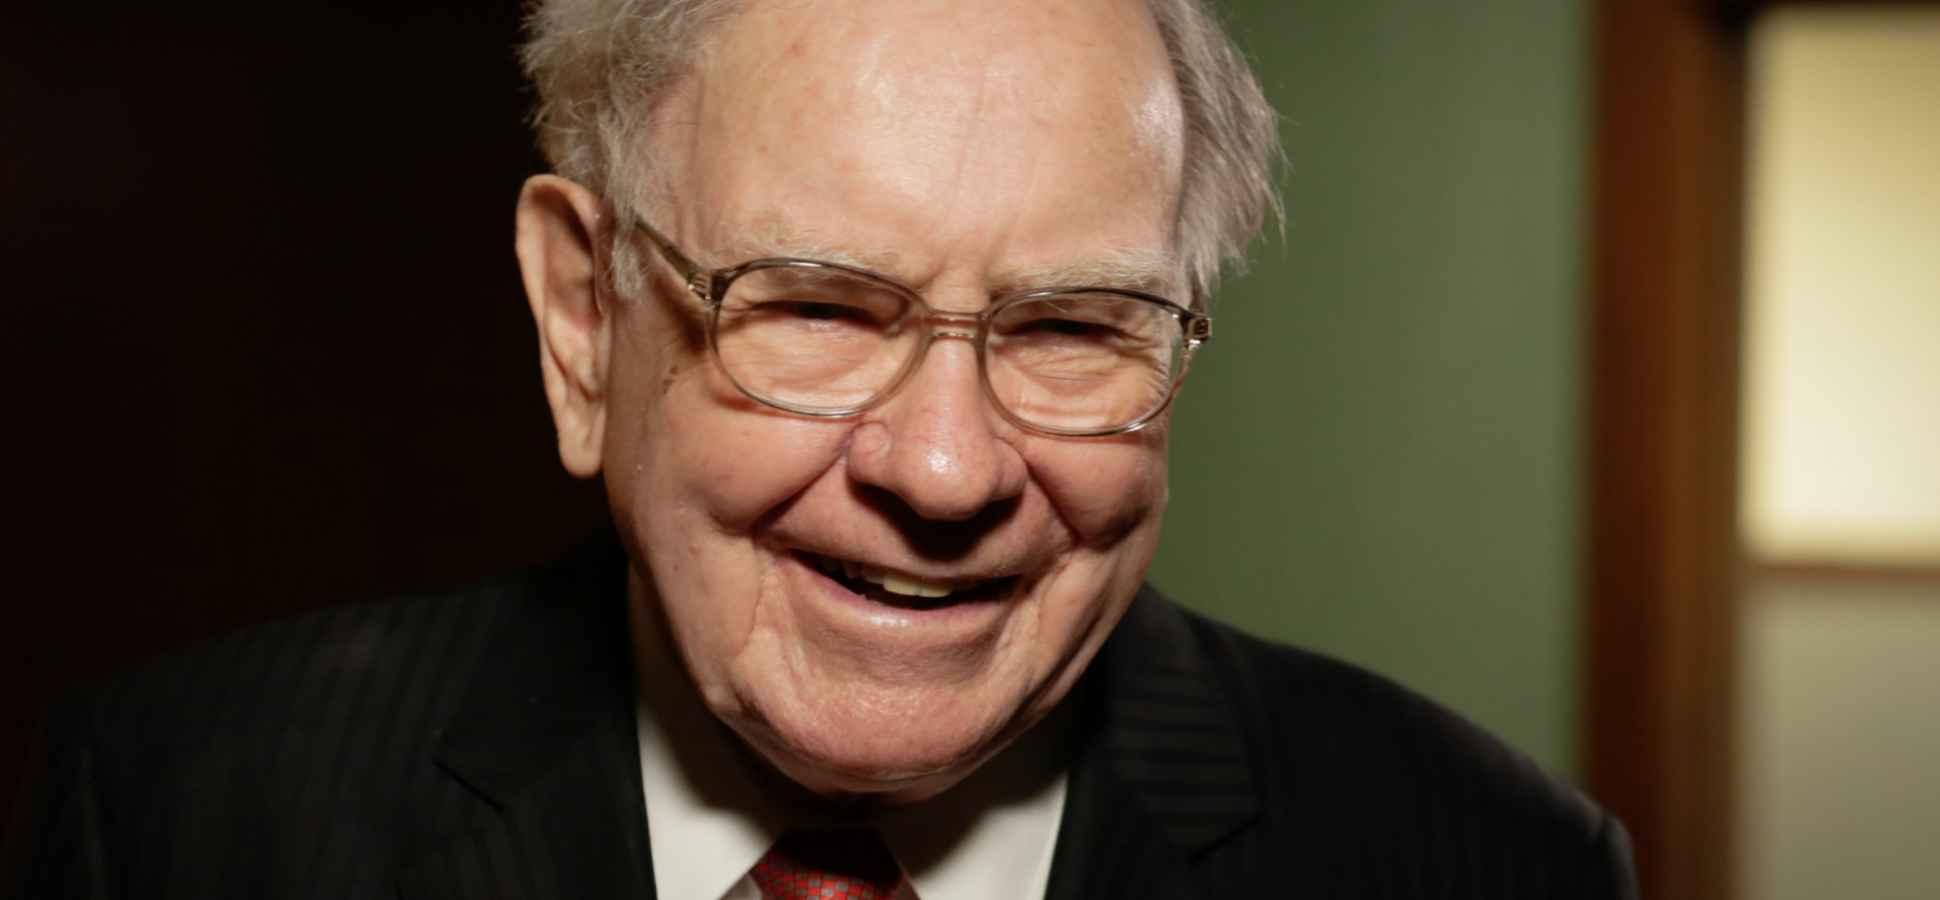 The One Secret That Made Warren Buffett the Best Investor in the World